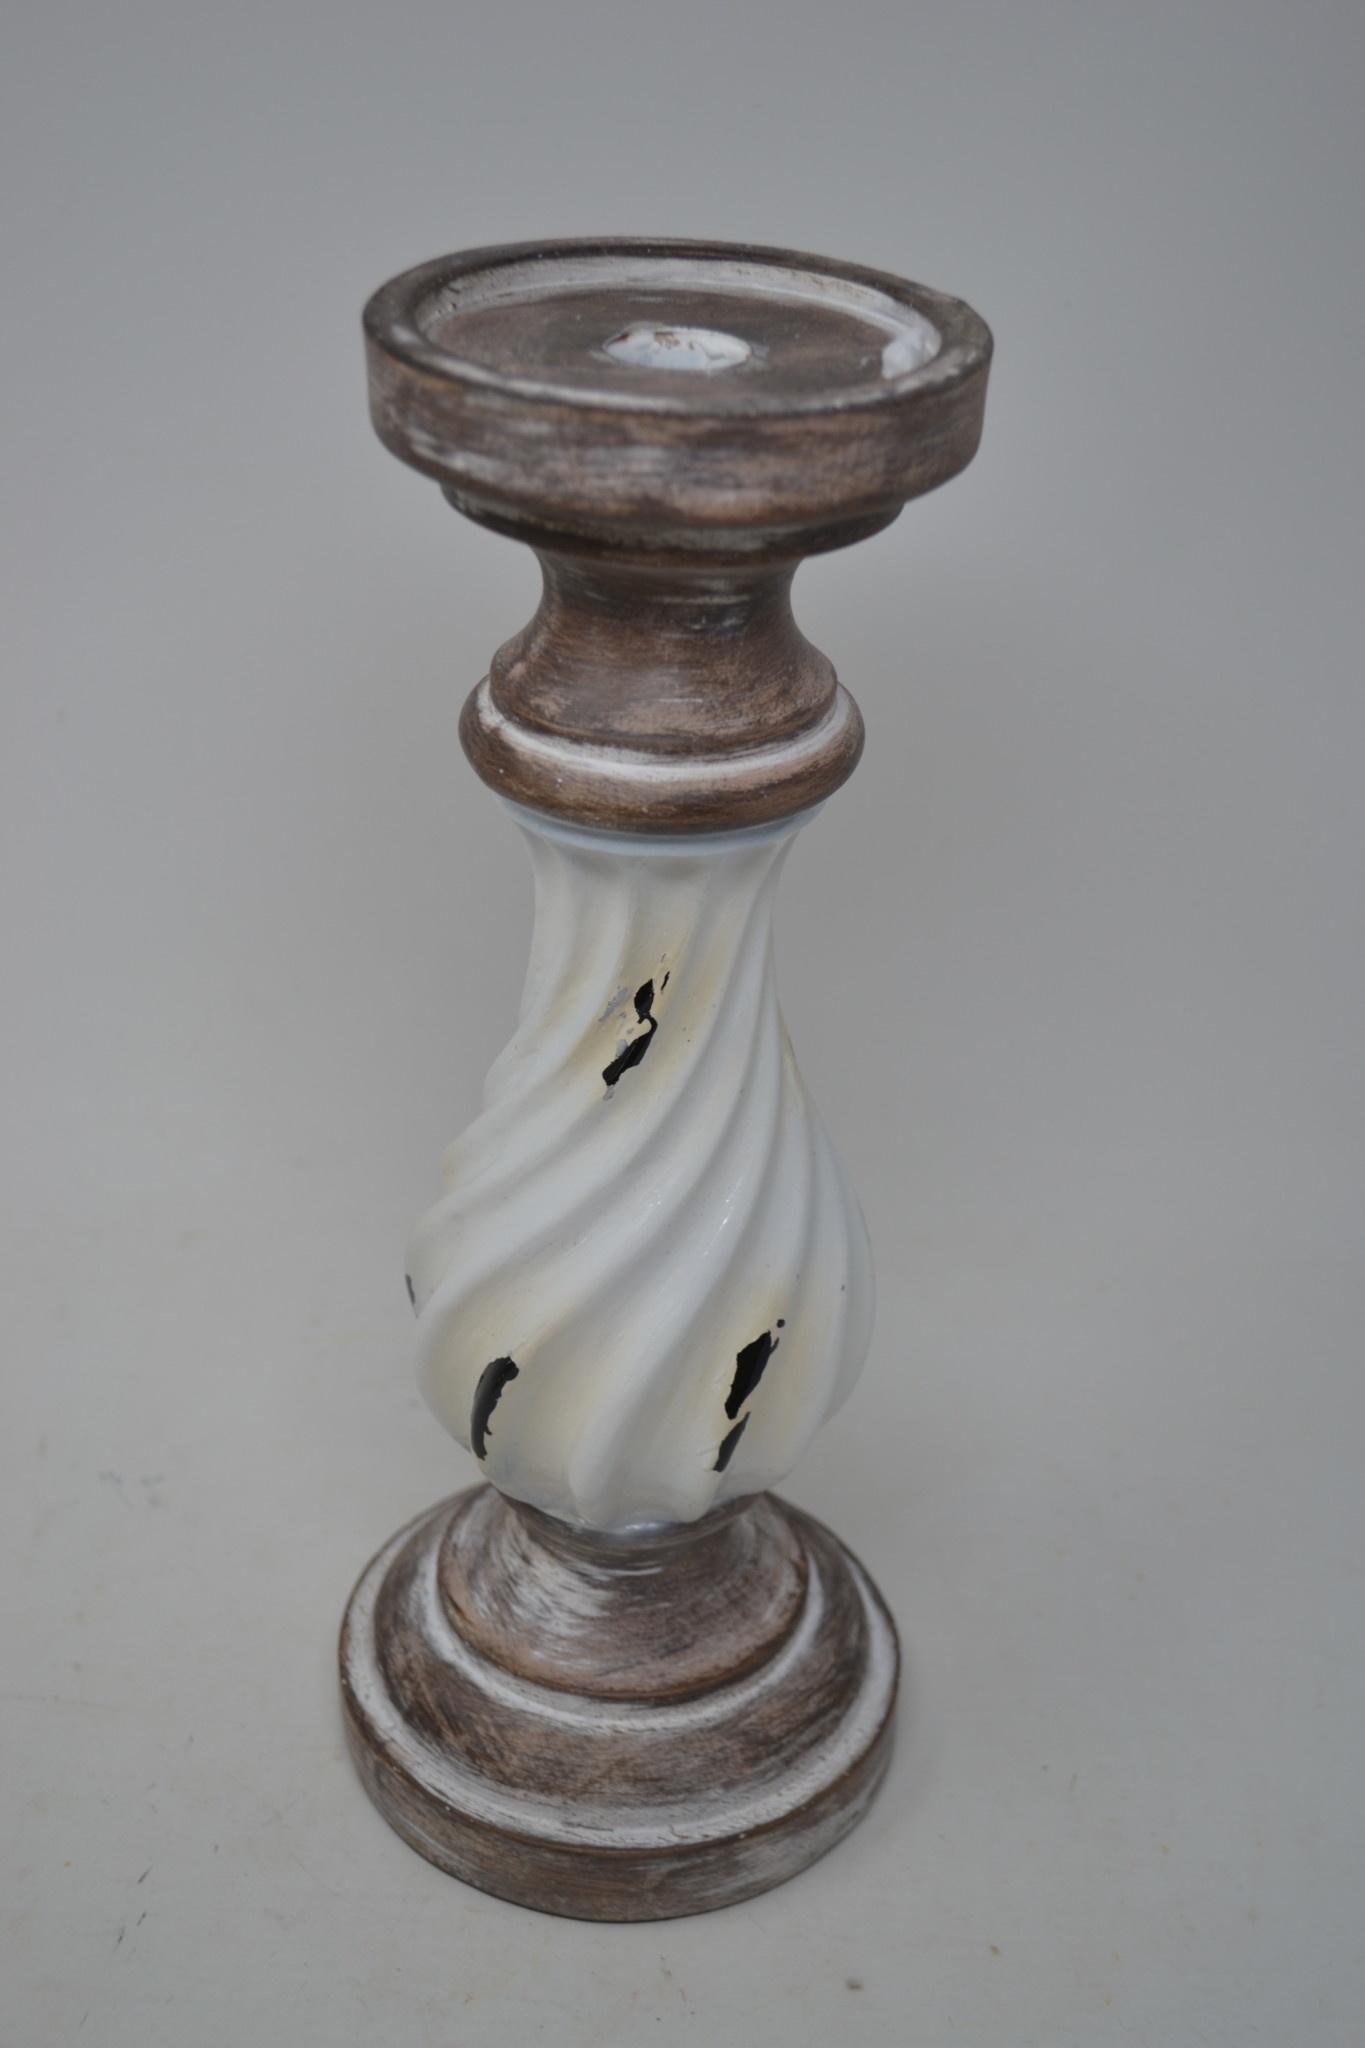 Distressed Cream Enamel Candlestick